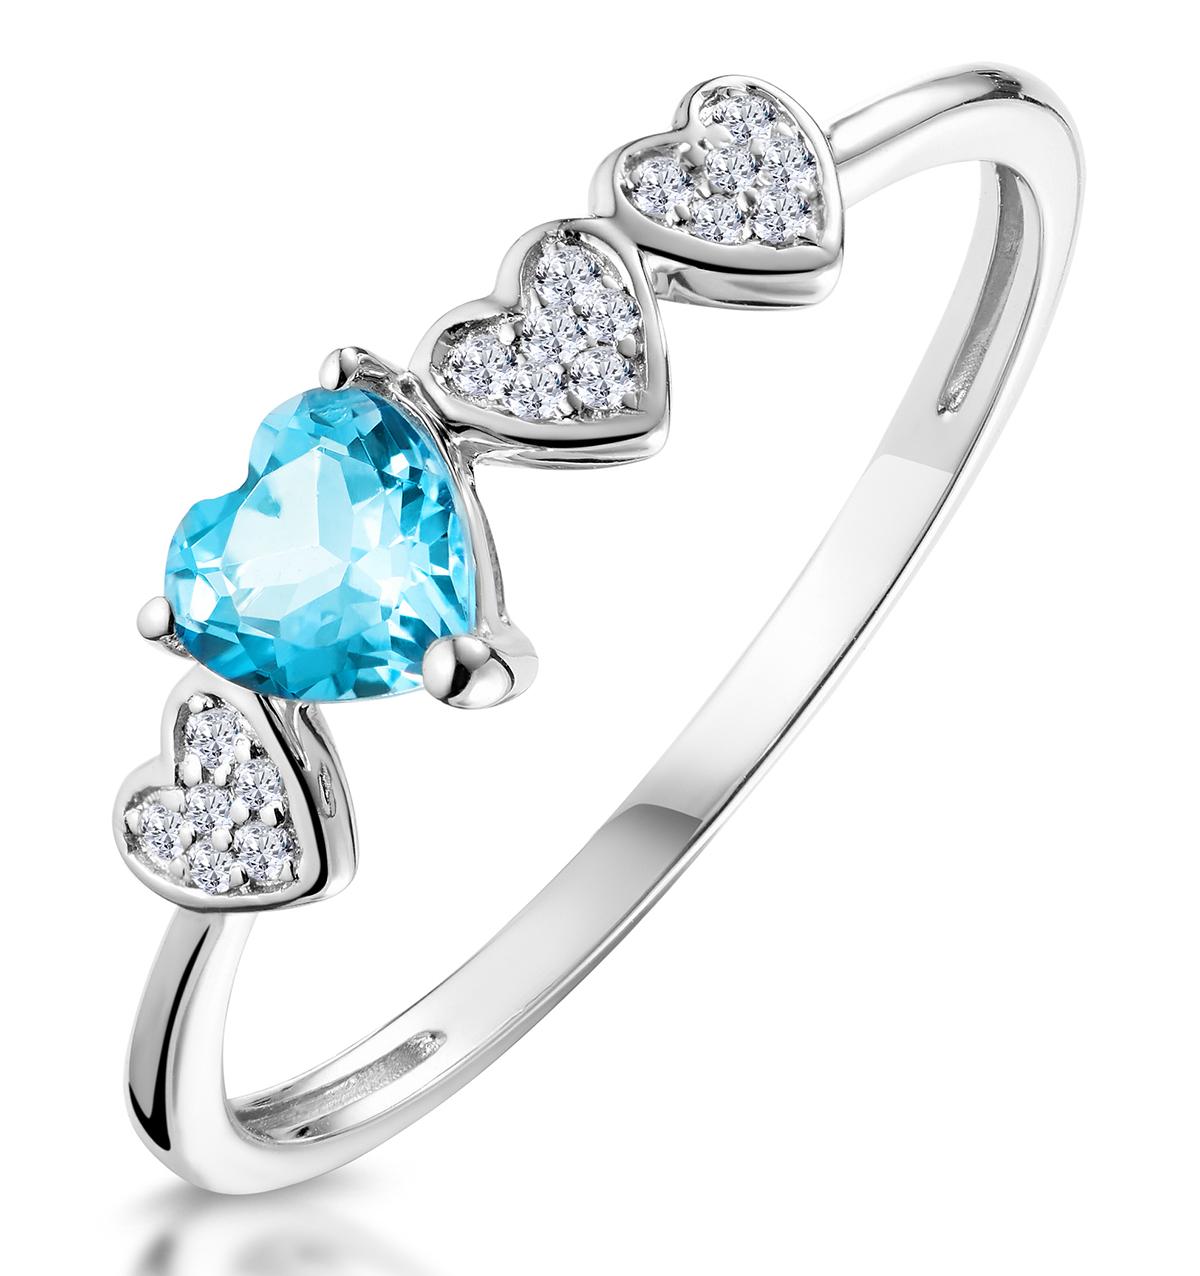 0.39CT SWISS BLUE TOPAZ AND STELLATO DIAMOND RING IN 9K WHITE GOLD